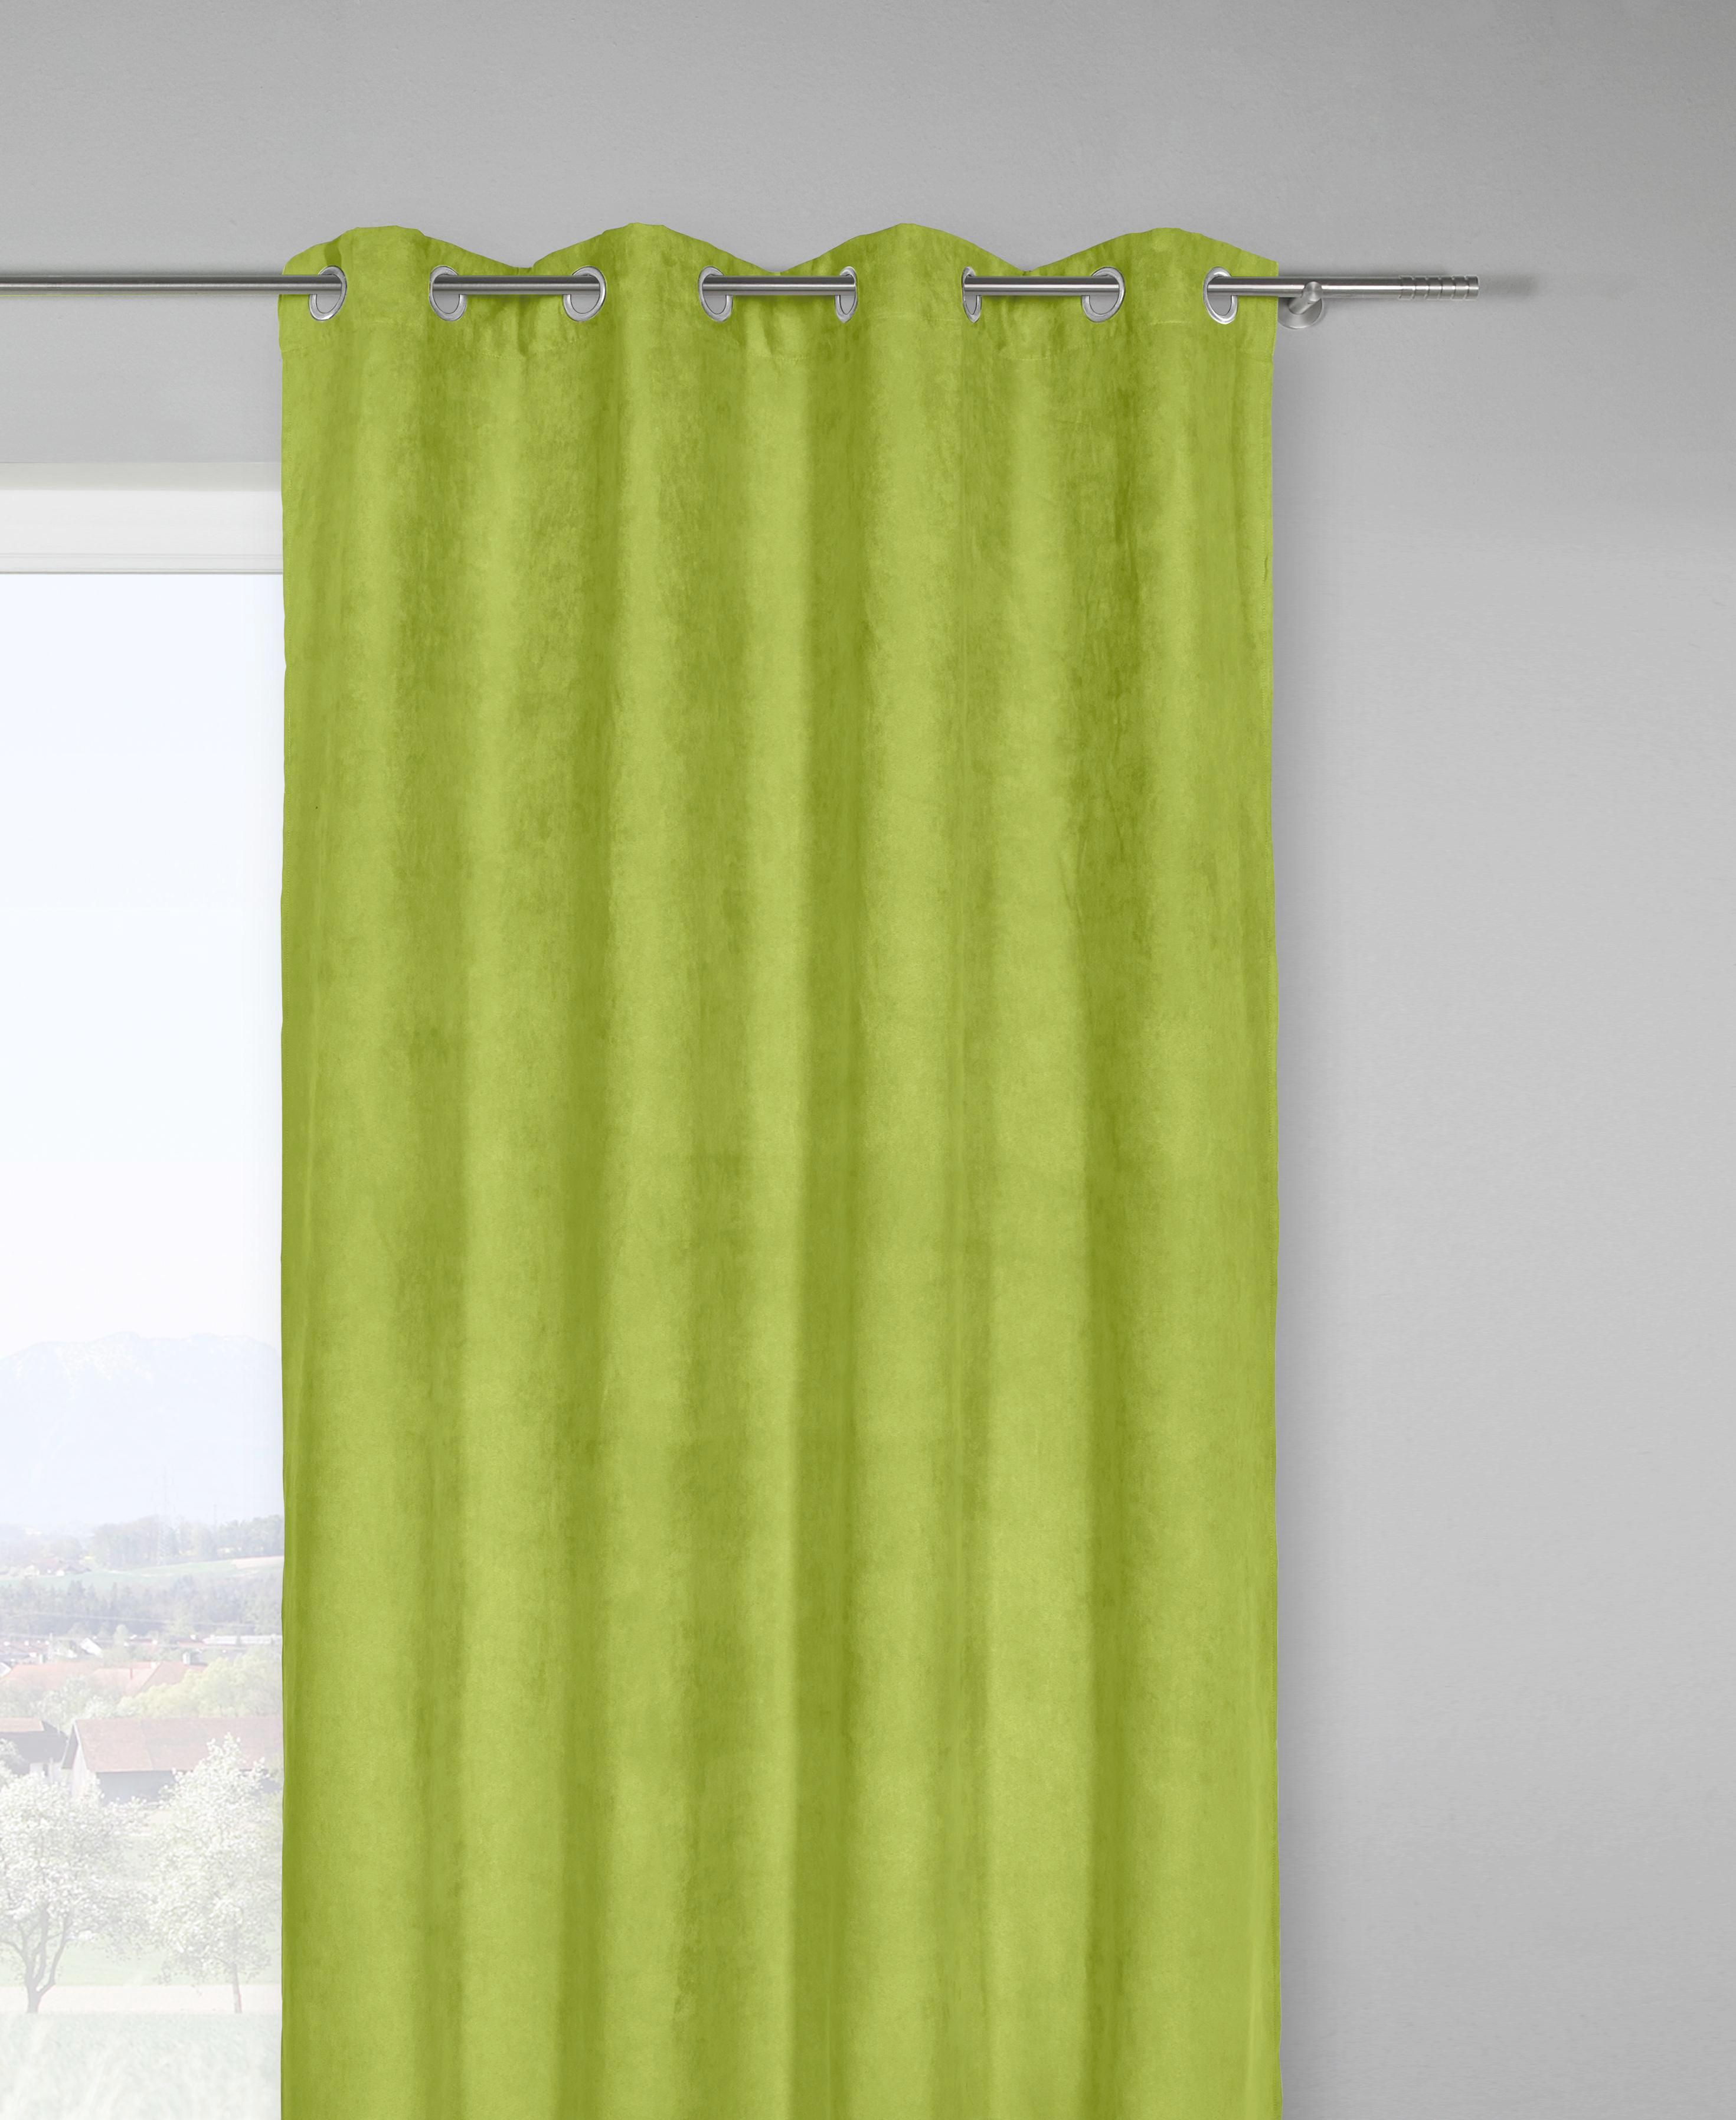 Fertigvorhang Velours ca. 140x245cm - Grün, KONVENTIONELL, Textil (140/245cm) - MÖMAX modern living